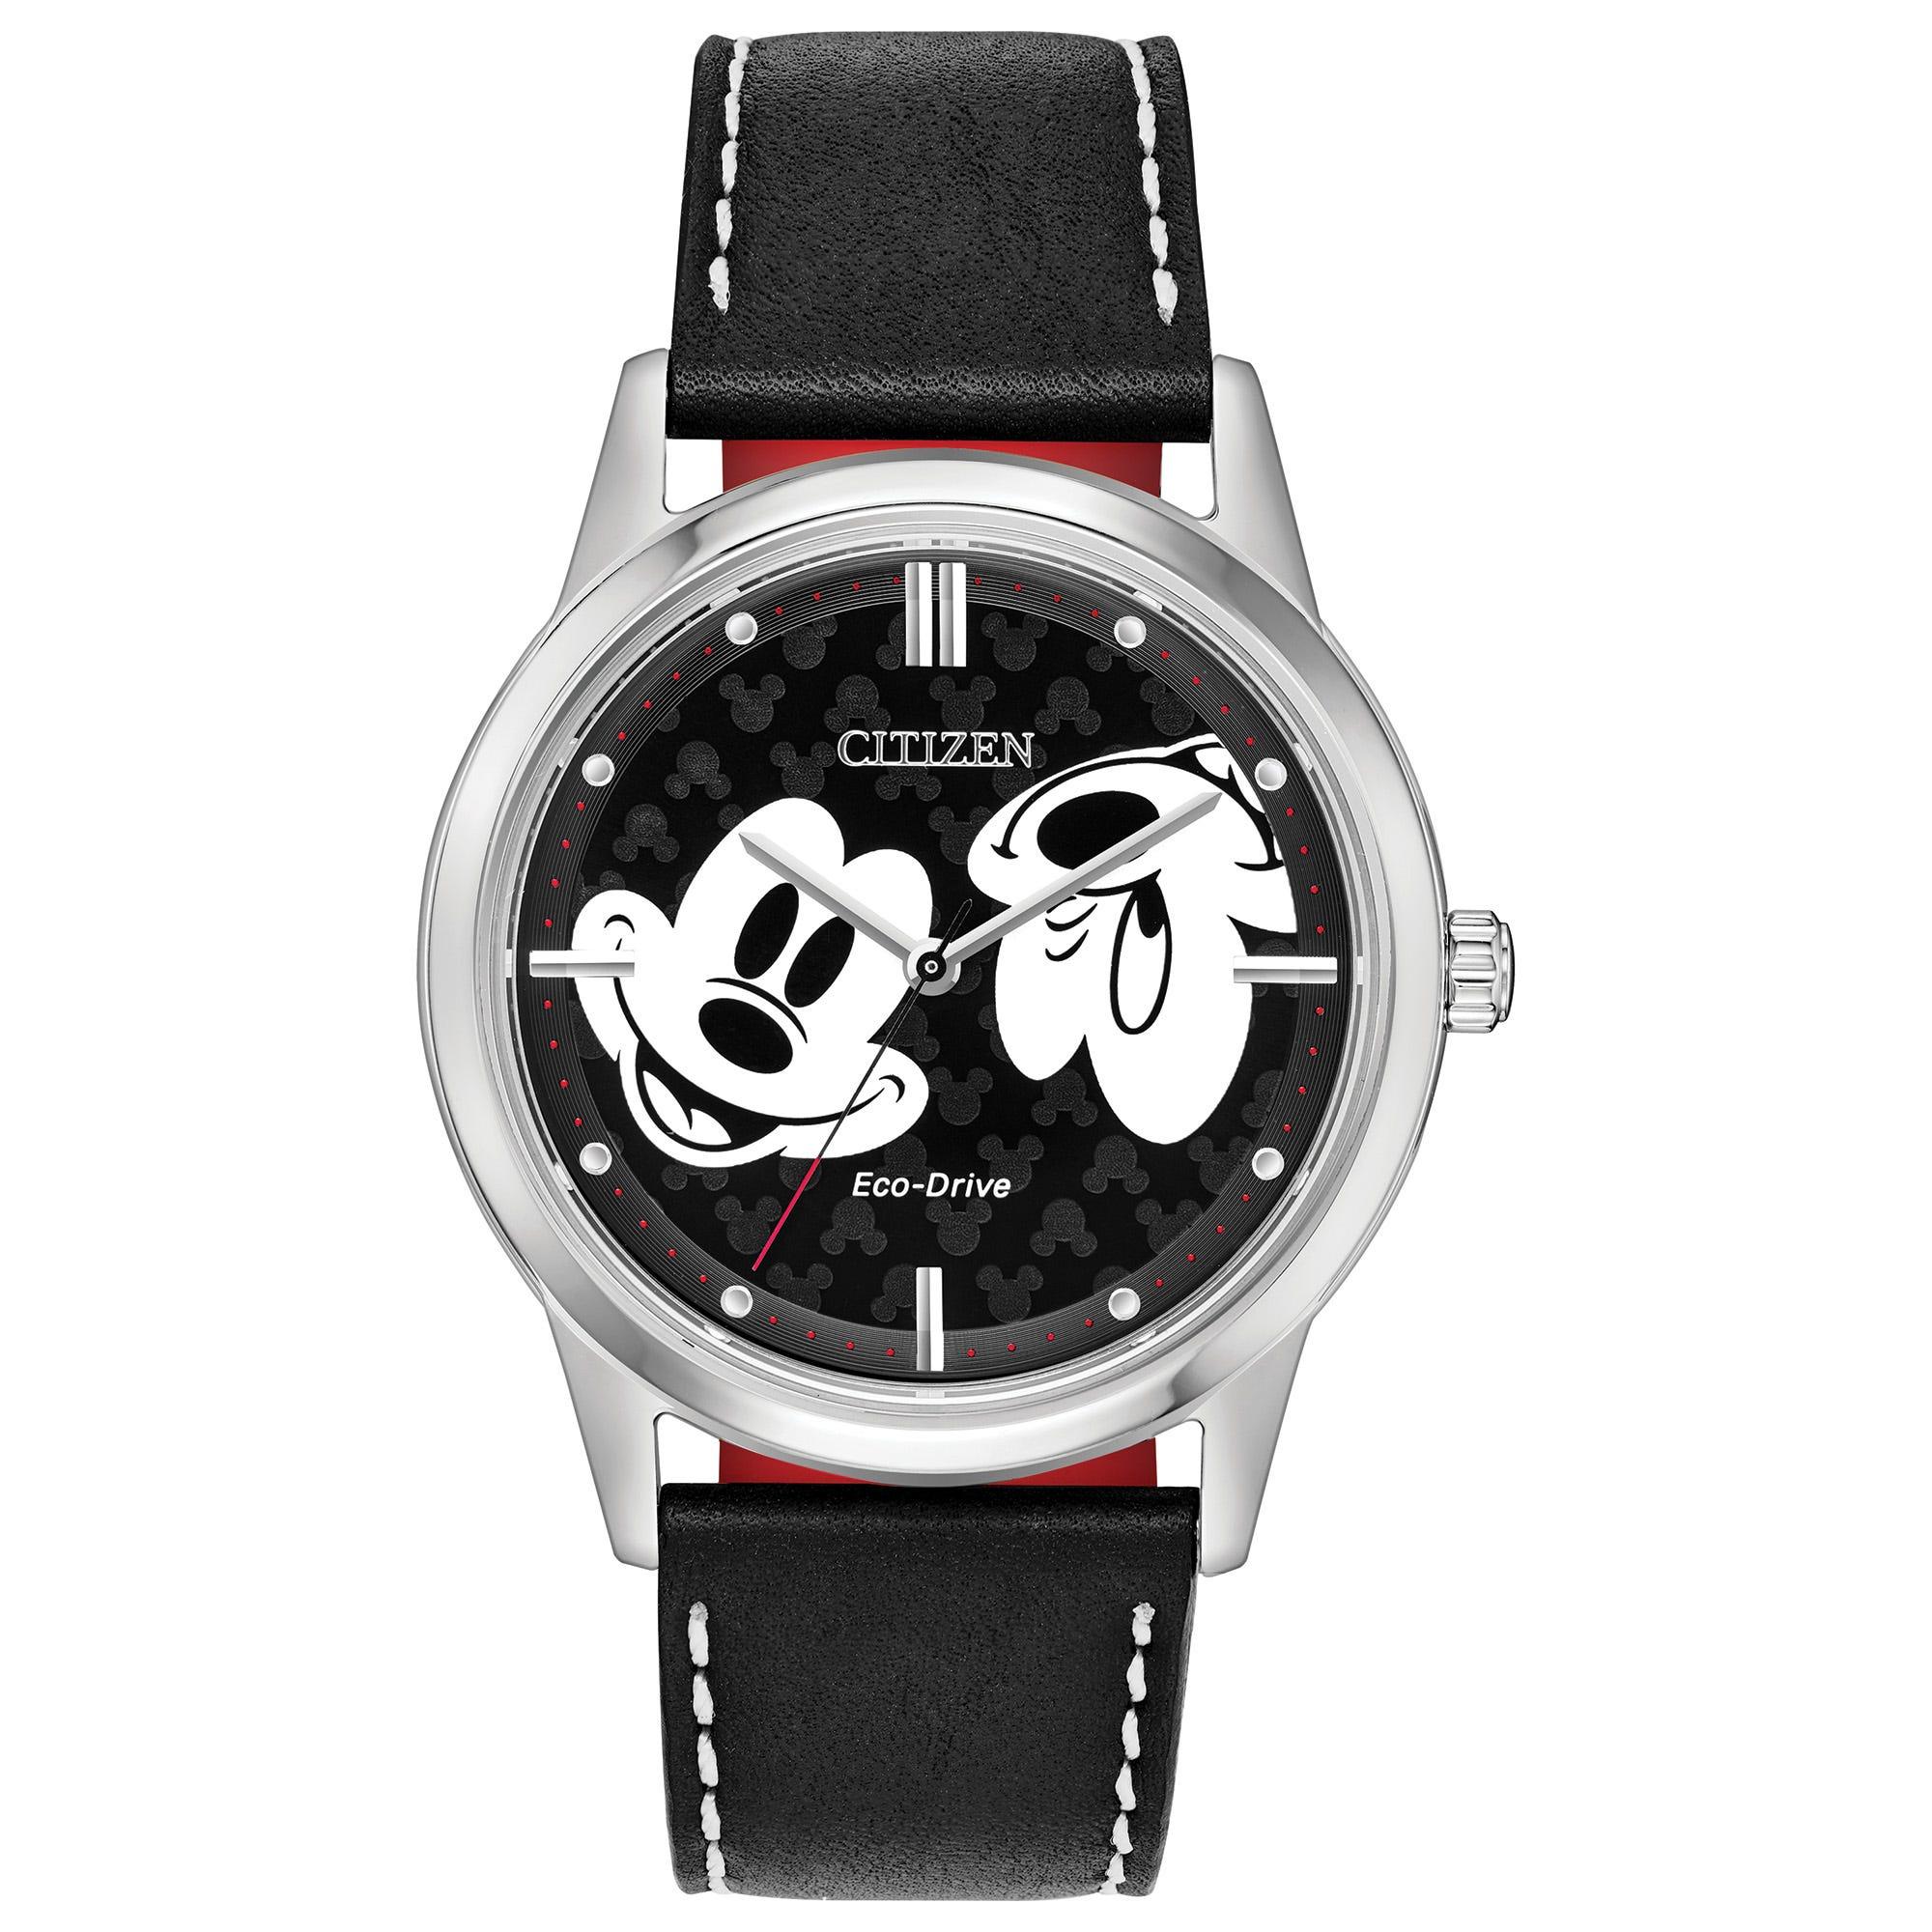 Citizen Disney Mickey Mouse Watch FE7060-05W